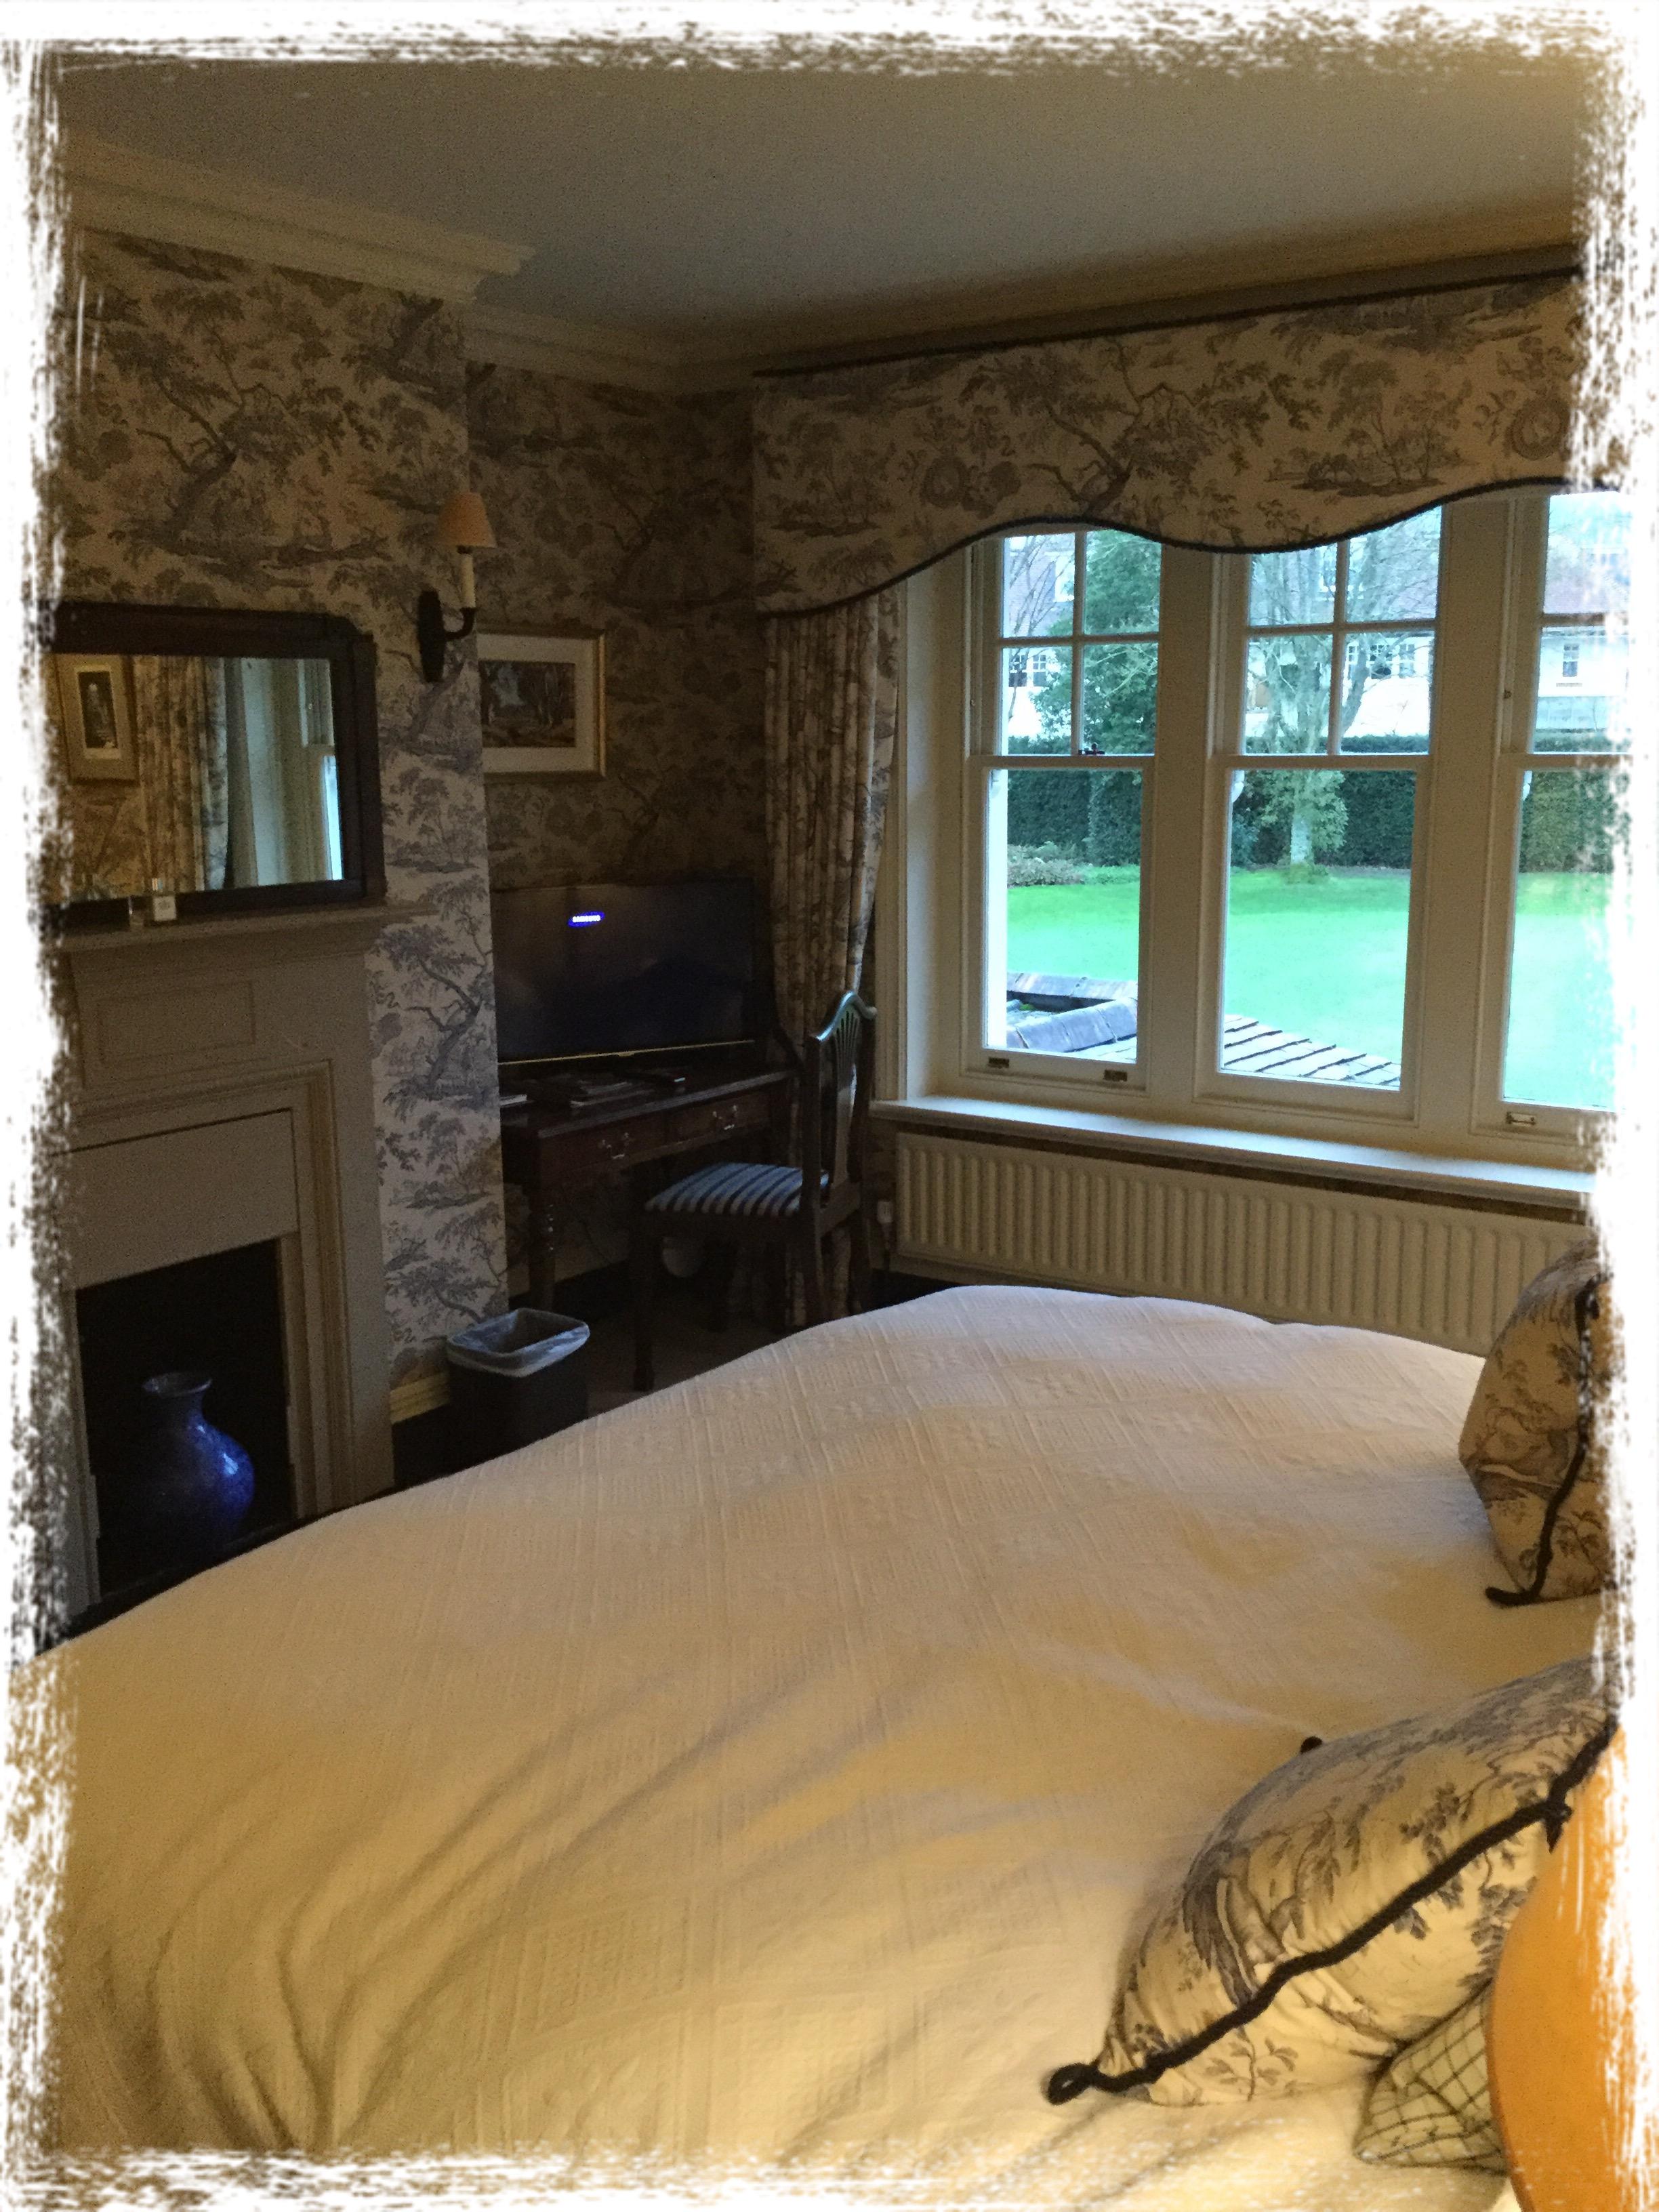 English countryside / O interior Ingles